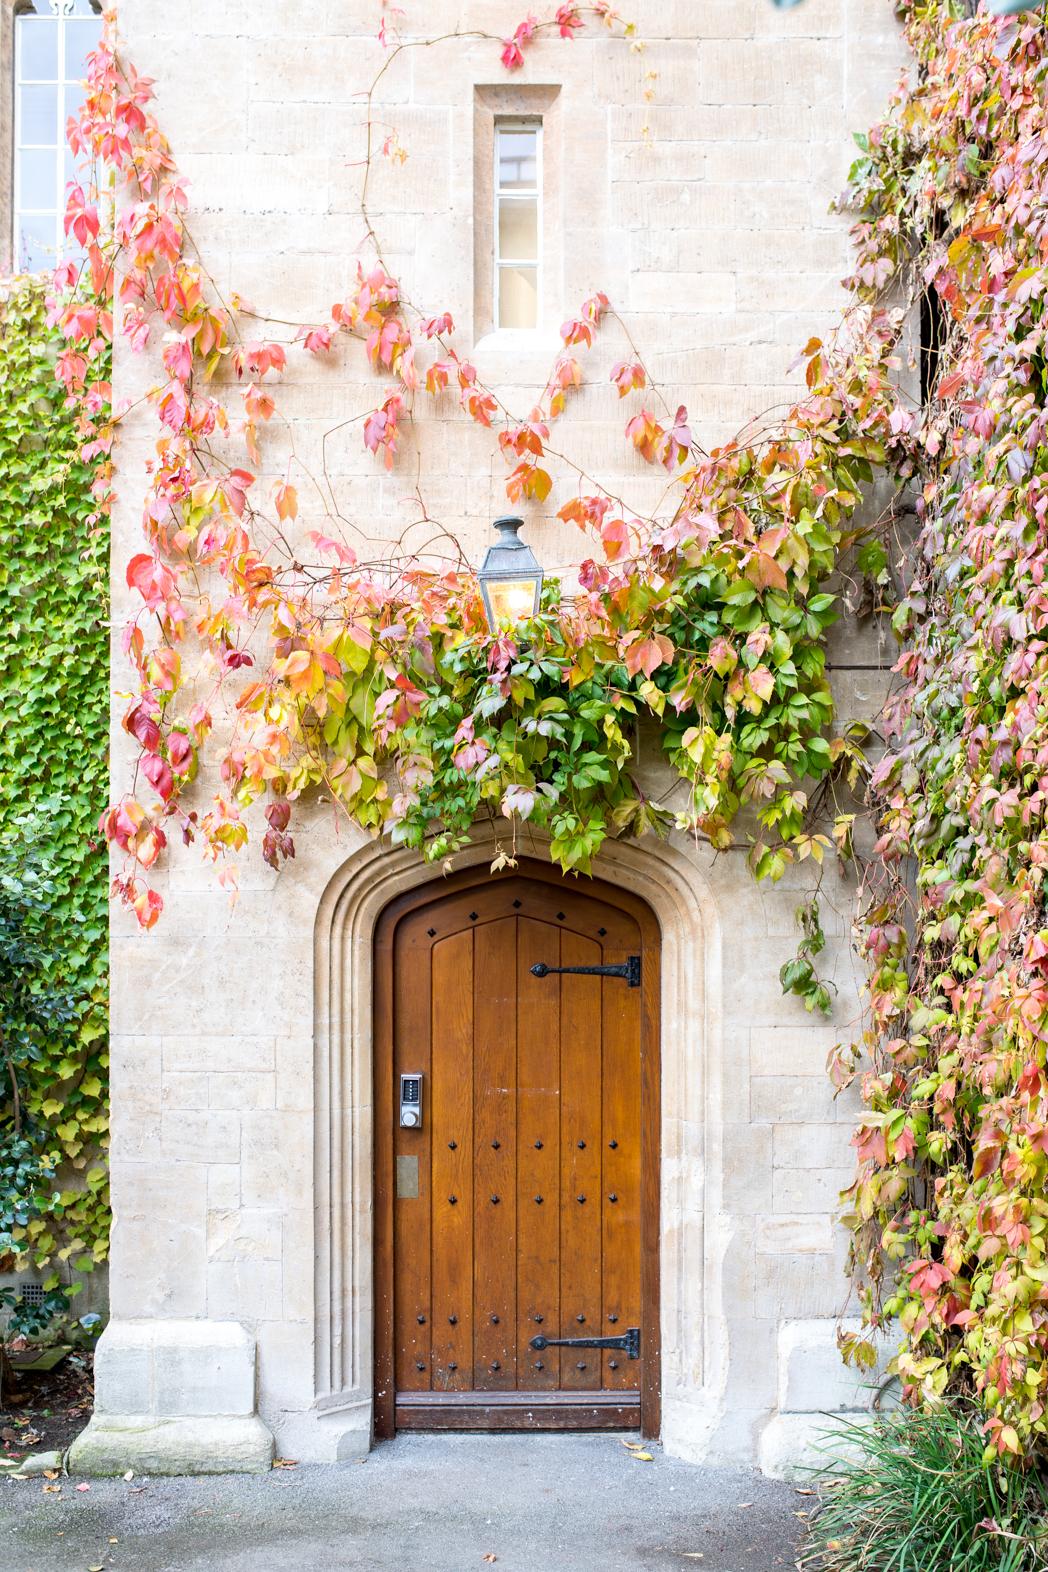 Stacie Flinner Oxford England-4.jpg